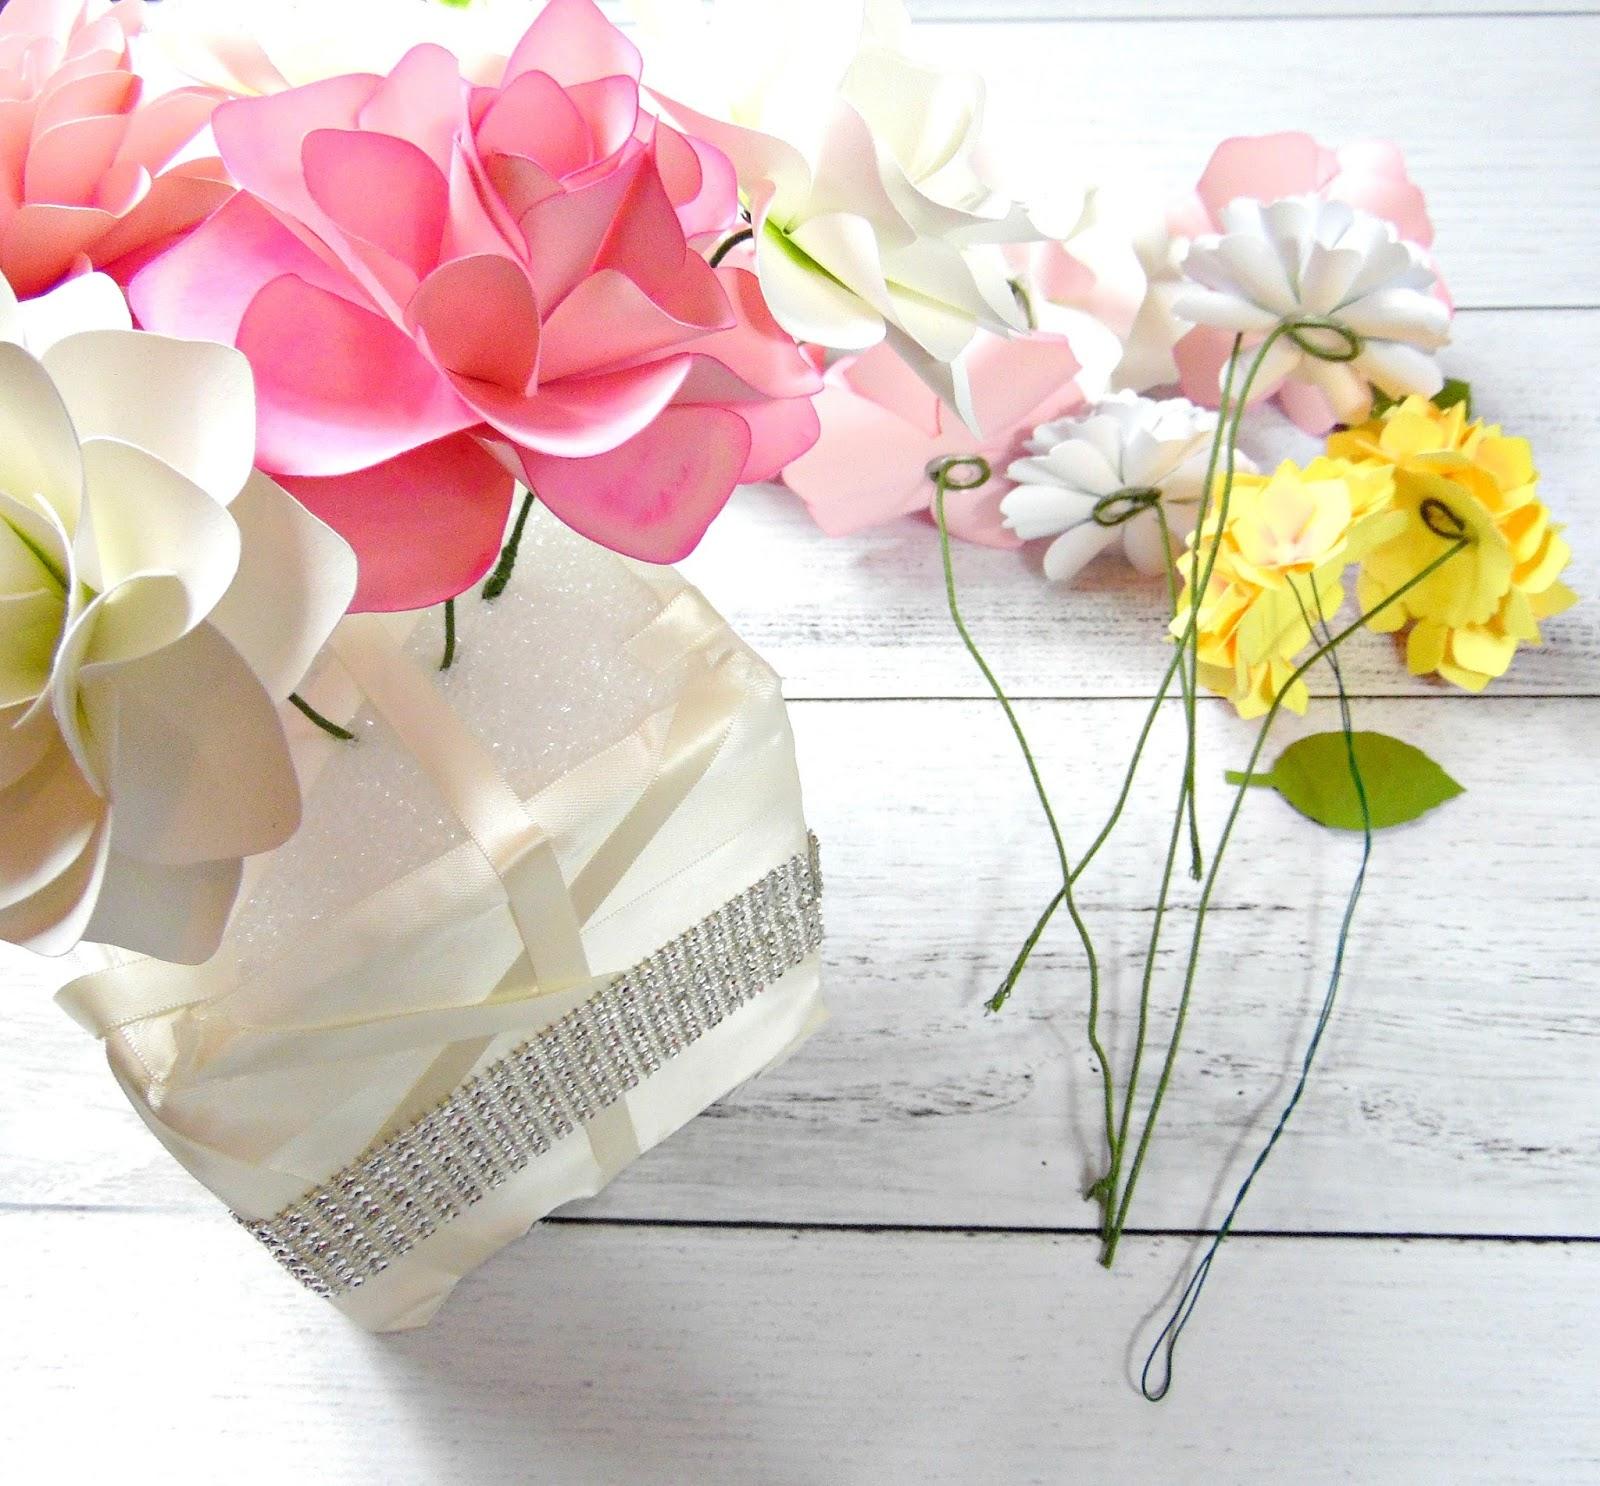 DIY Paper Floral Centerpiece - Catching Colorlfies